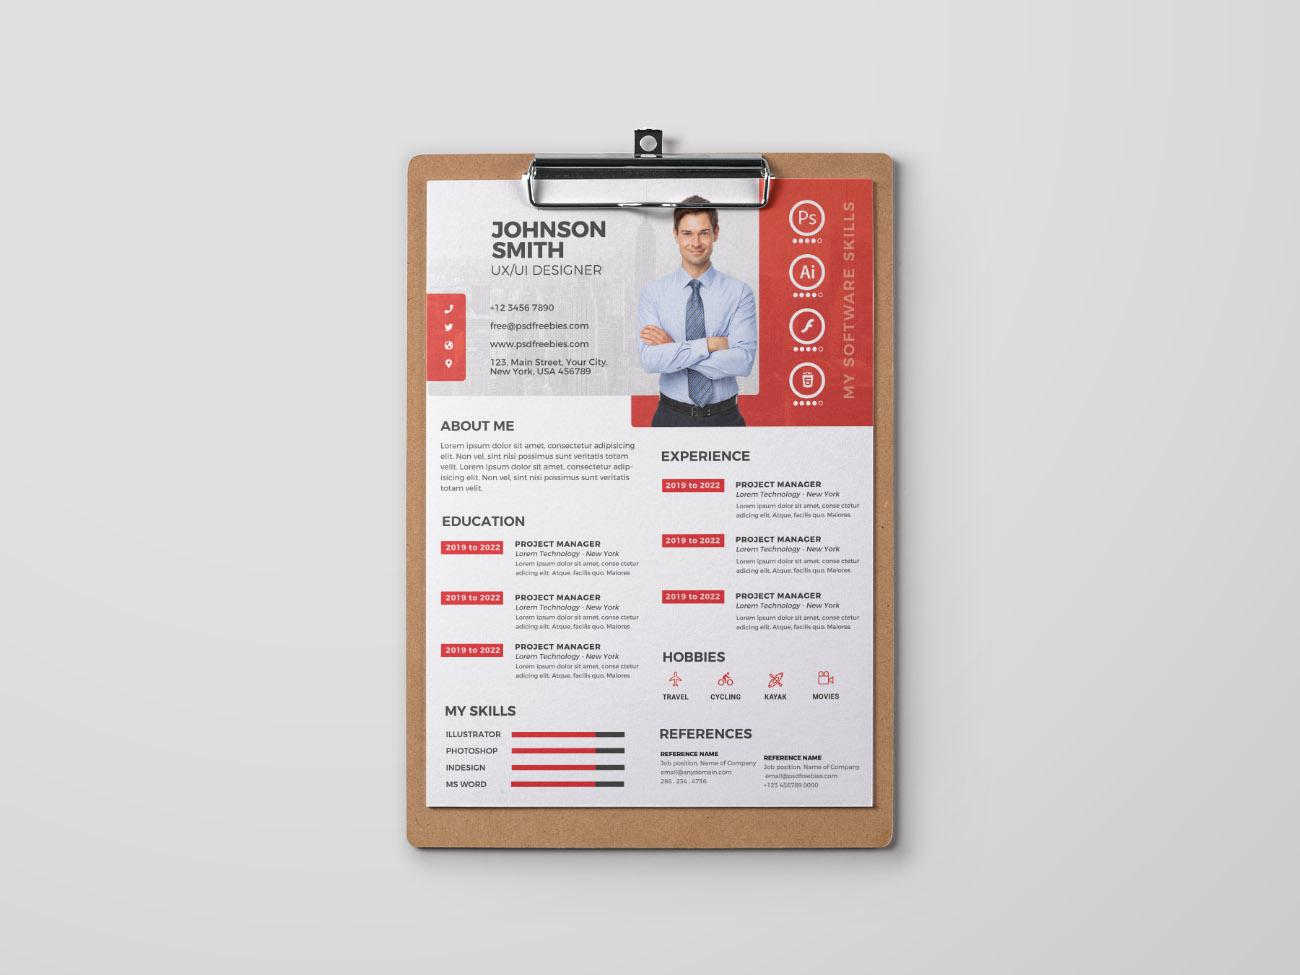 Free Formal PSD Resume Template free resume template free cv template freebies freebie free cv template curriculum vitae resume design cv